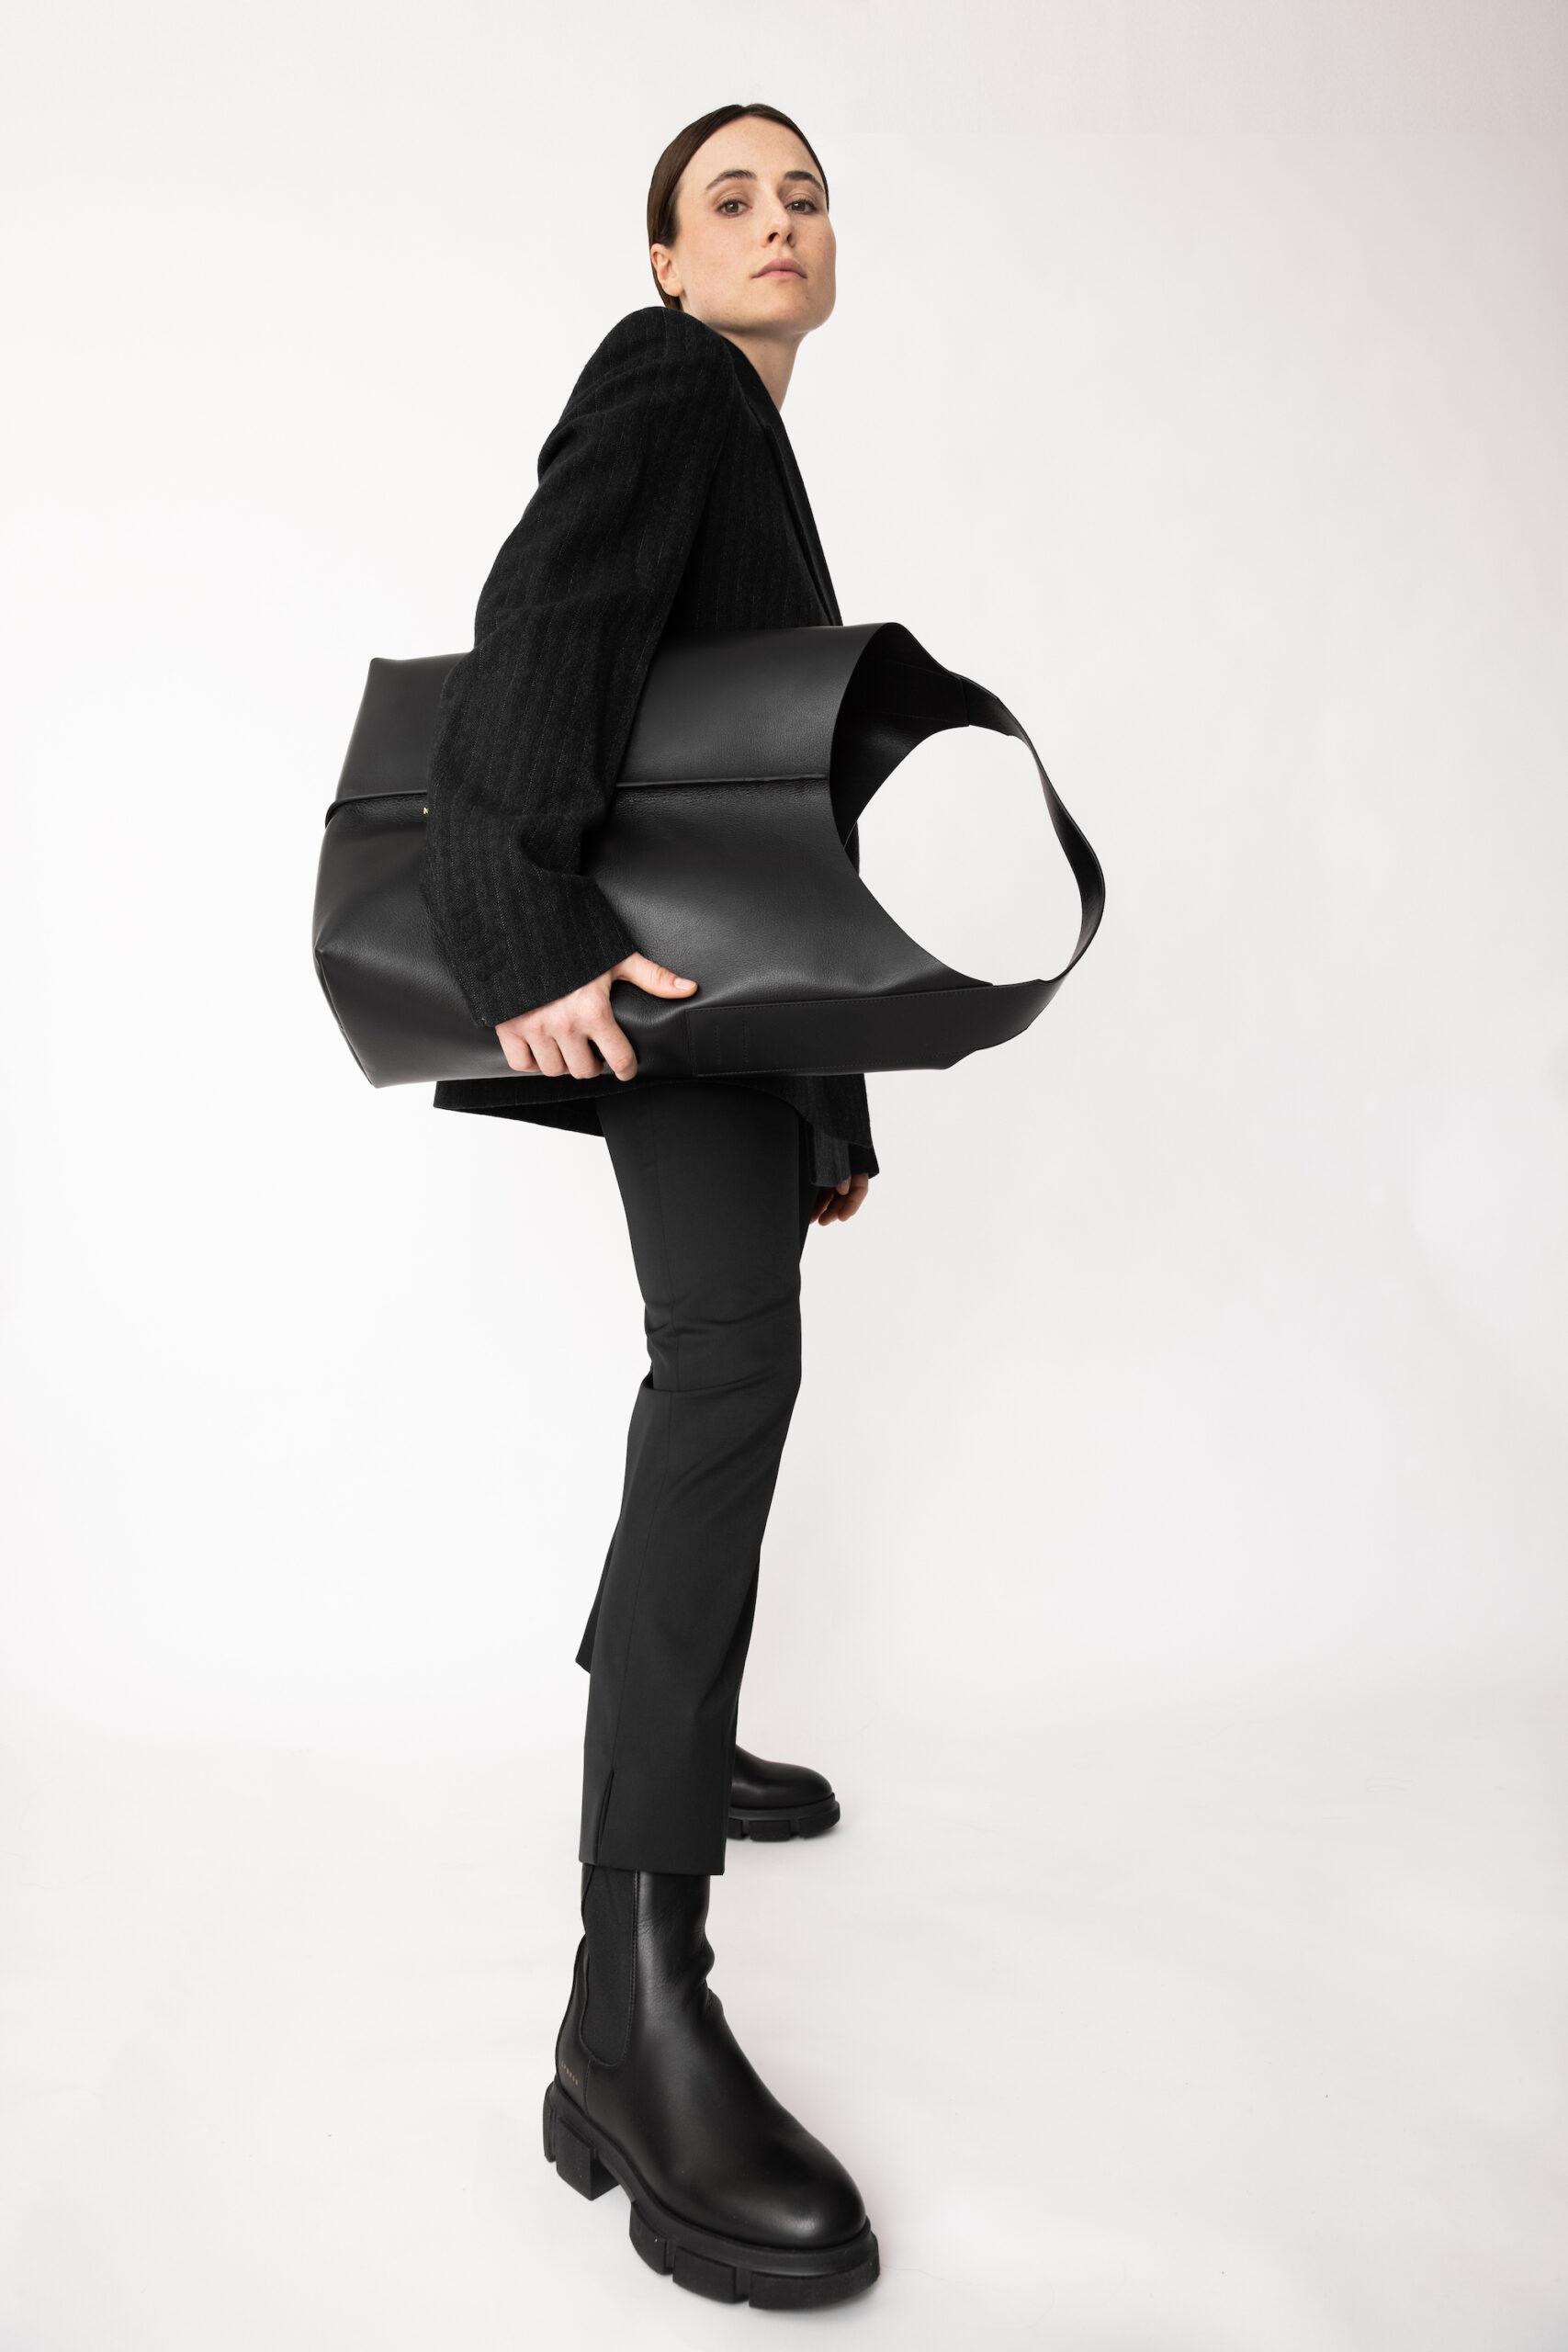 Lena Lademann with CPH Bag 1 vitello black and CPH500 vitello black